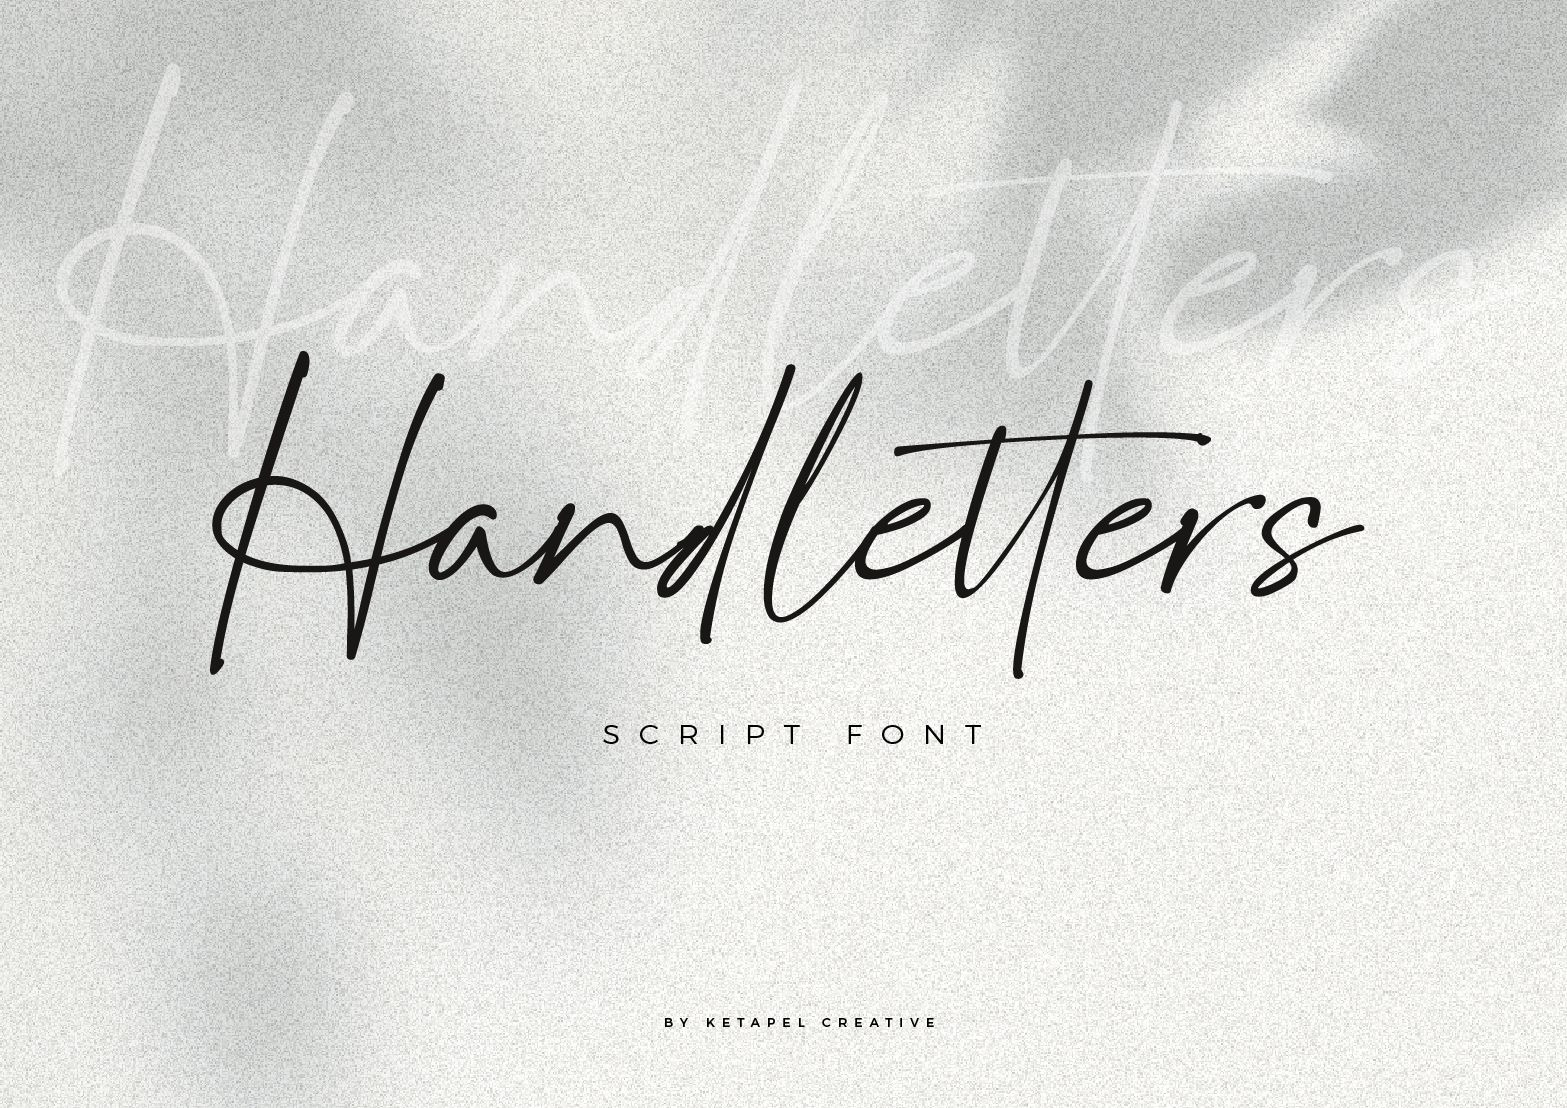 Handletters Handwritten Script Font-1